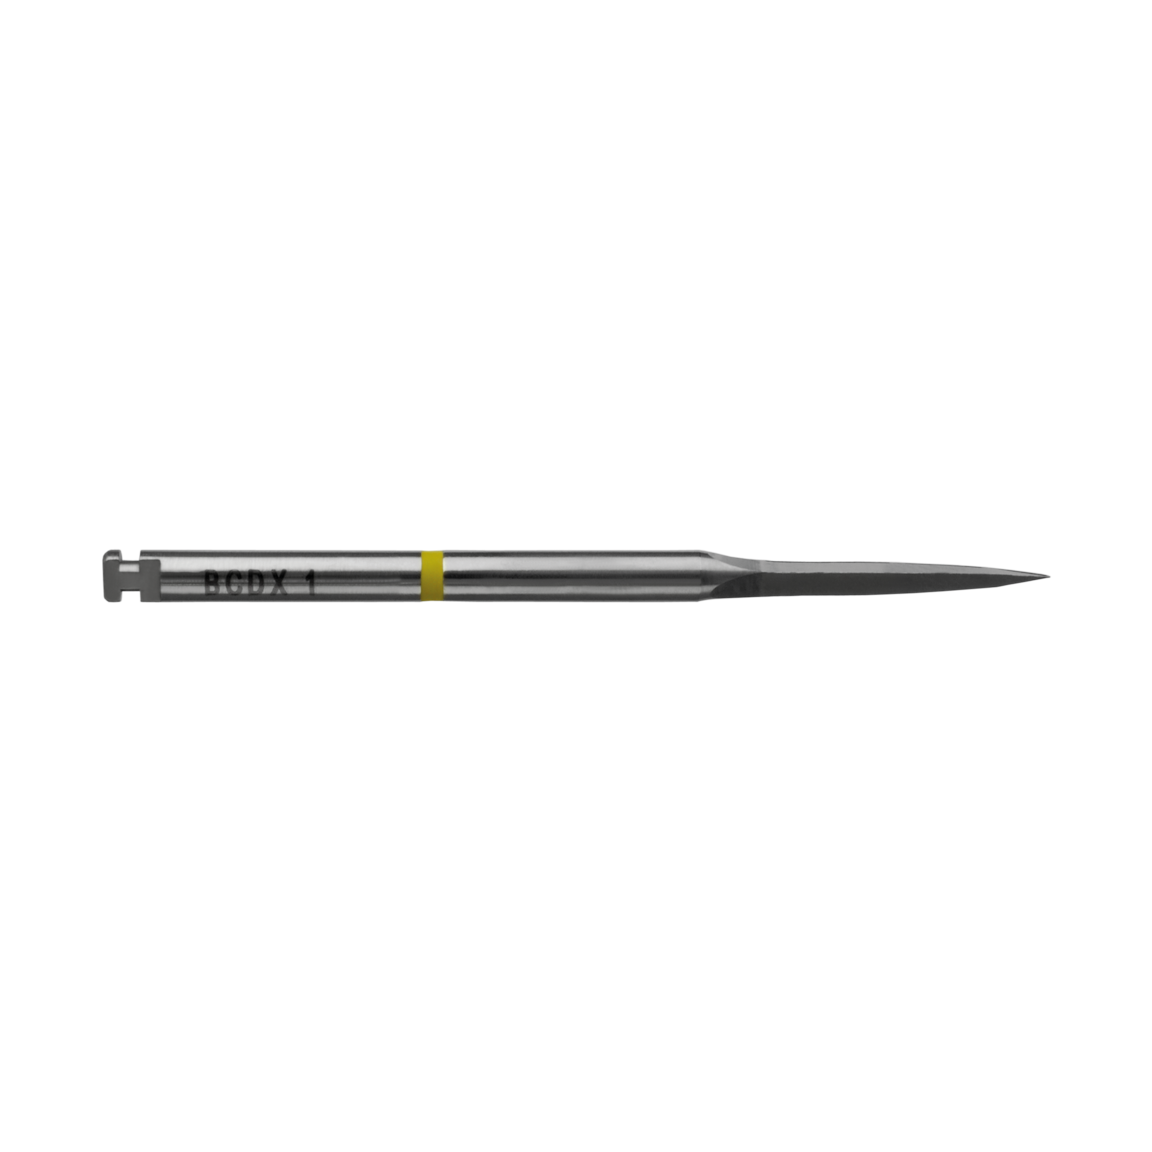 Pfadfinder Bohrer BCDX 1